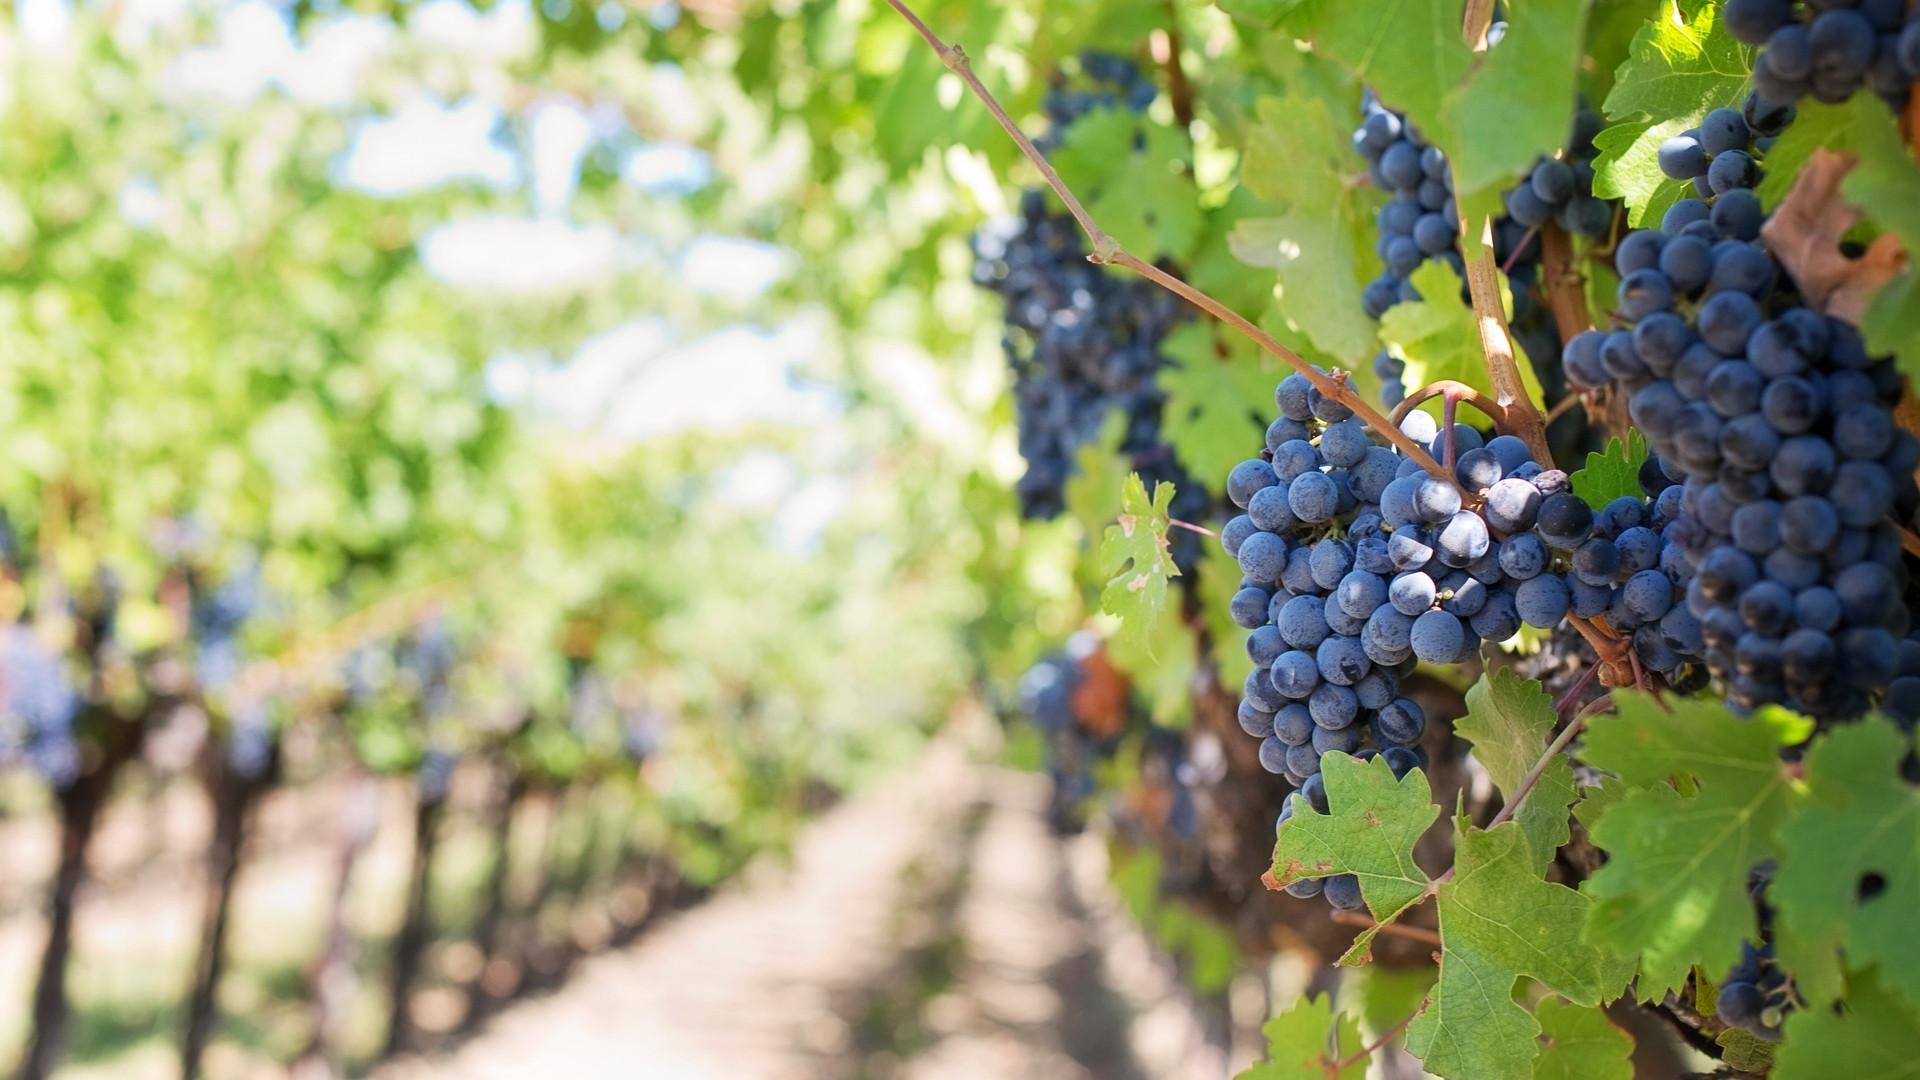 berries-blur-blurry-39351.jpg